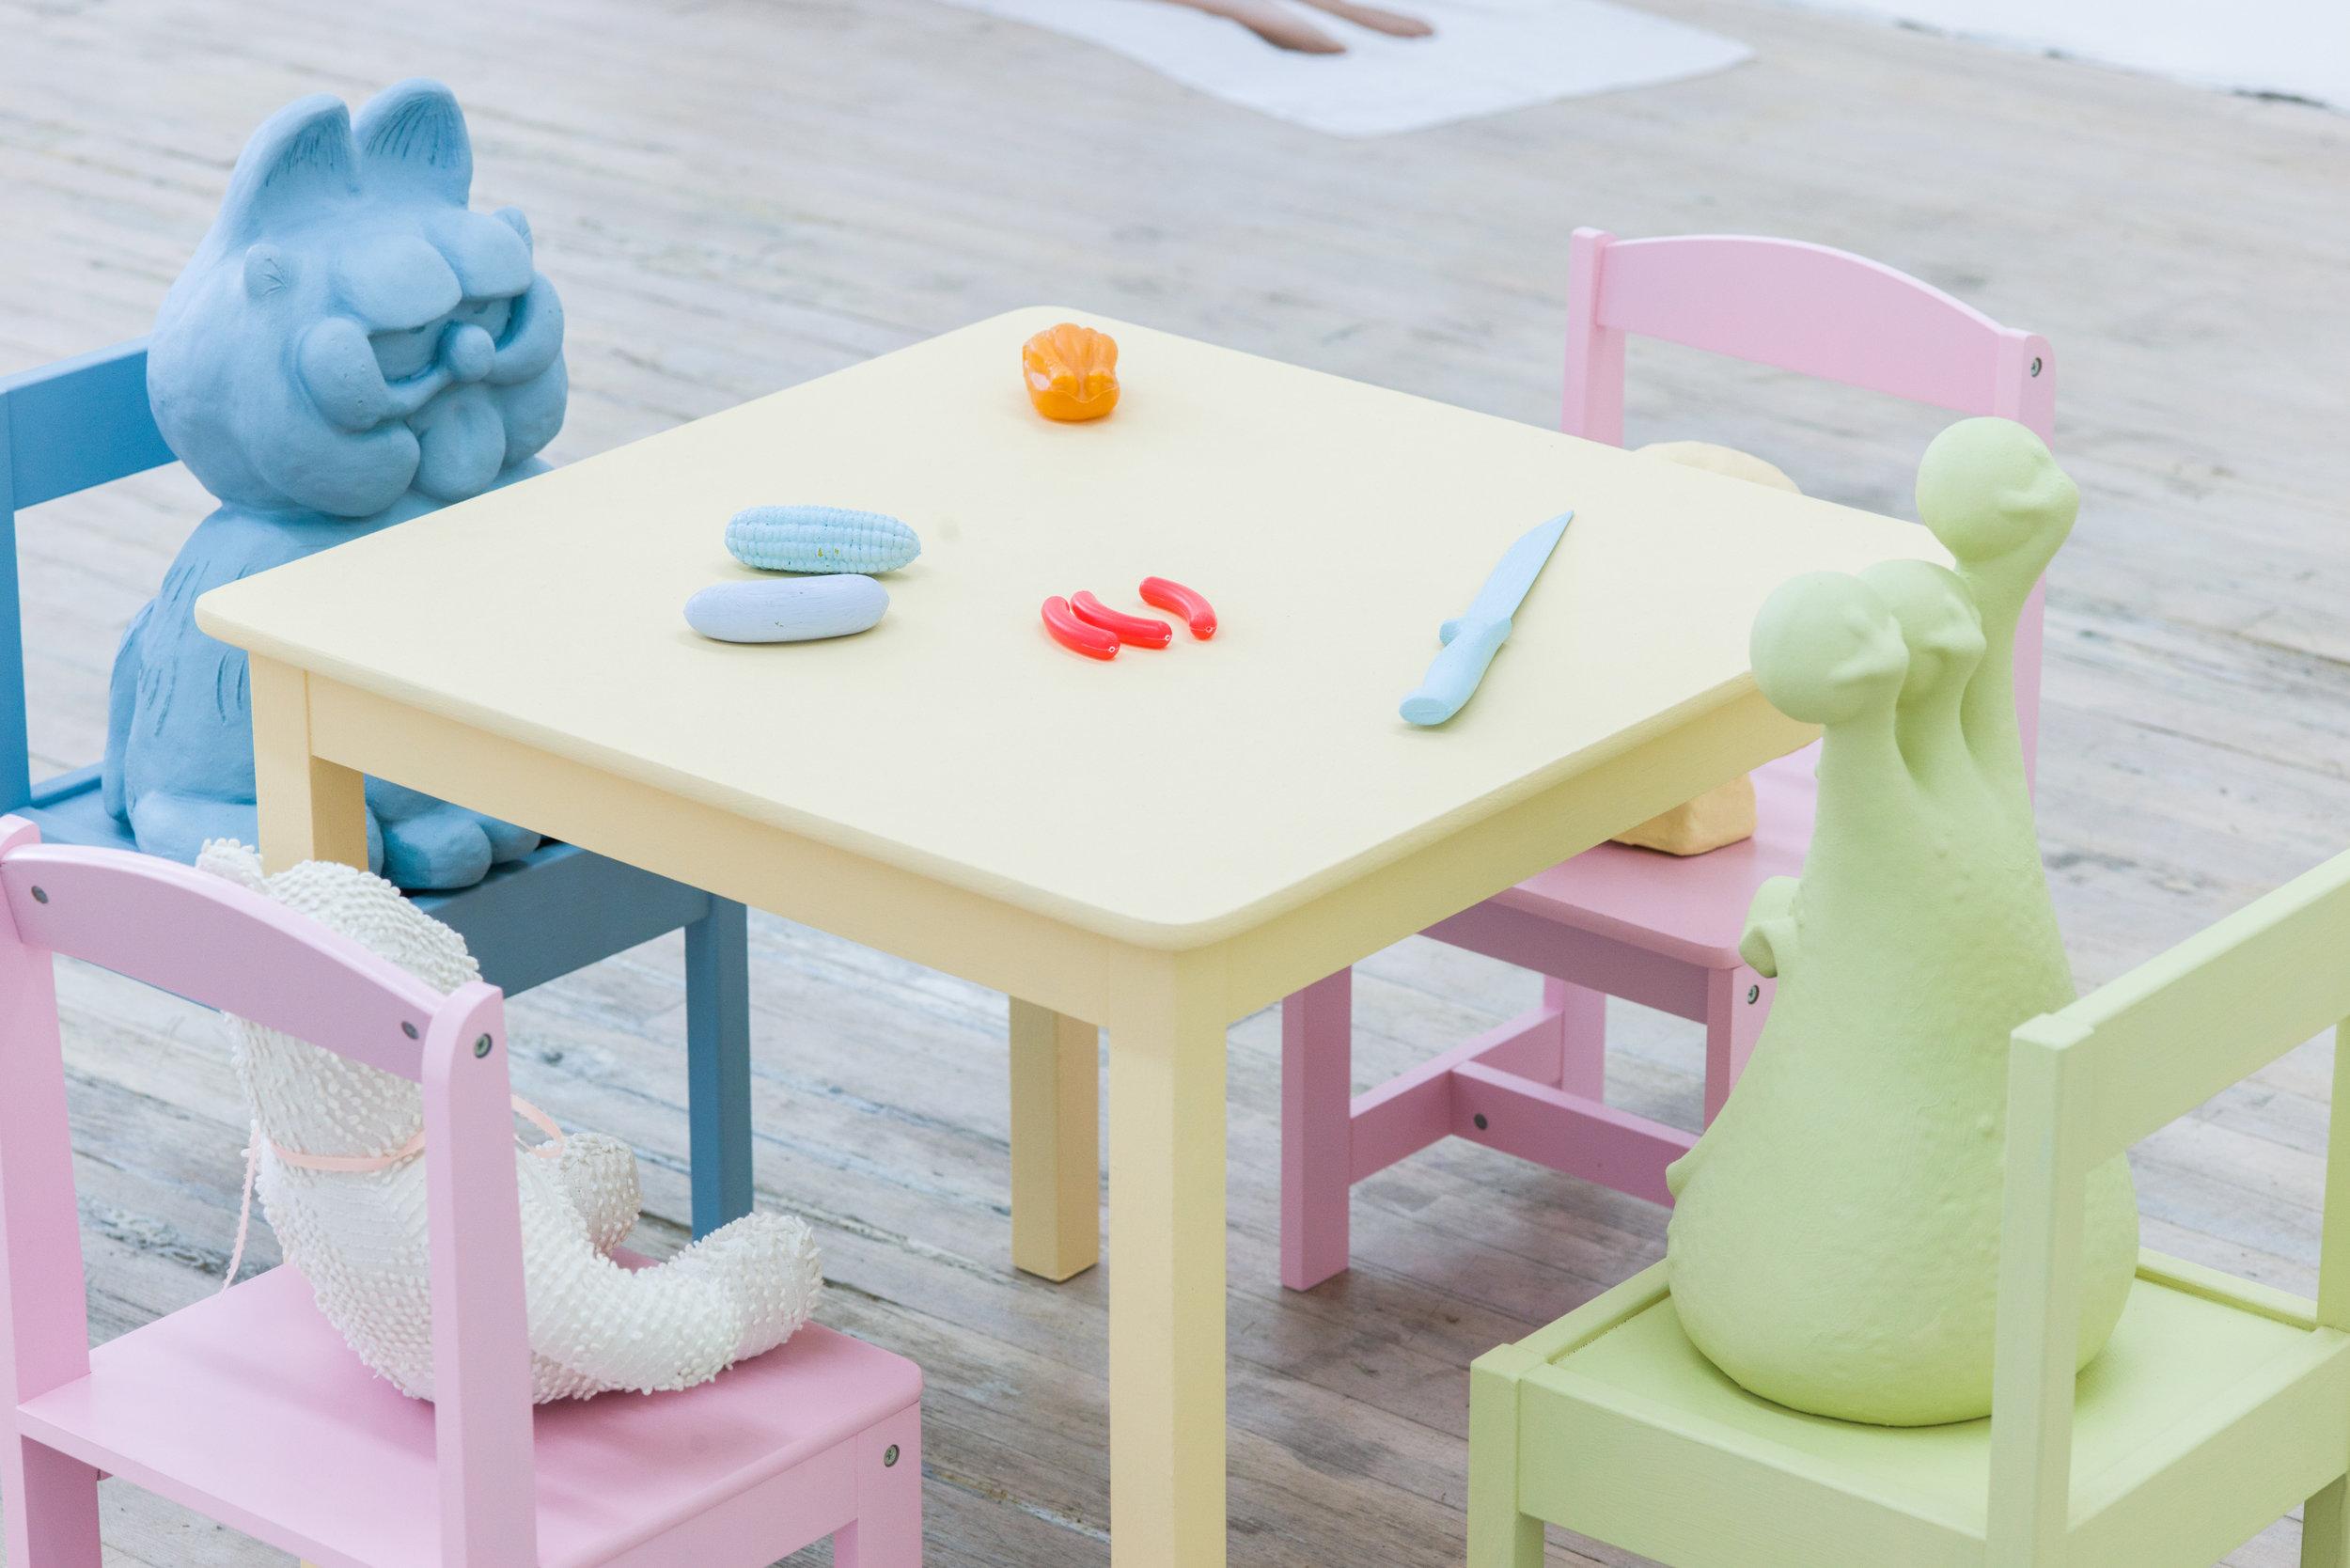 Brian Kokoska   Tea Party (Make A Deathwish),  2018  Wood, acrylic, plastic, metal, vintage teddy bear, glass, clay 46.5 x 44 x 26 inches